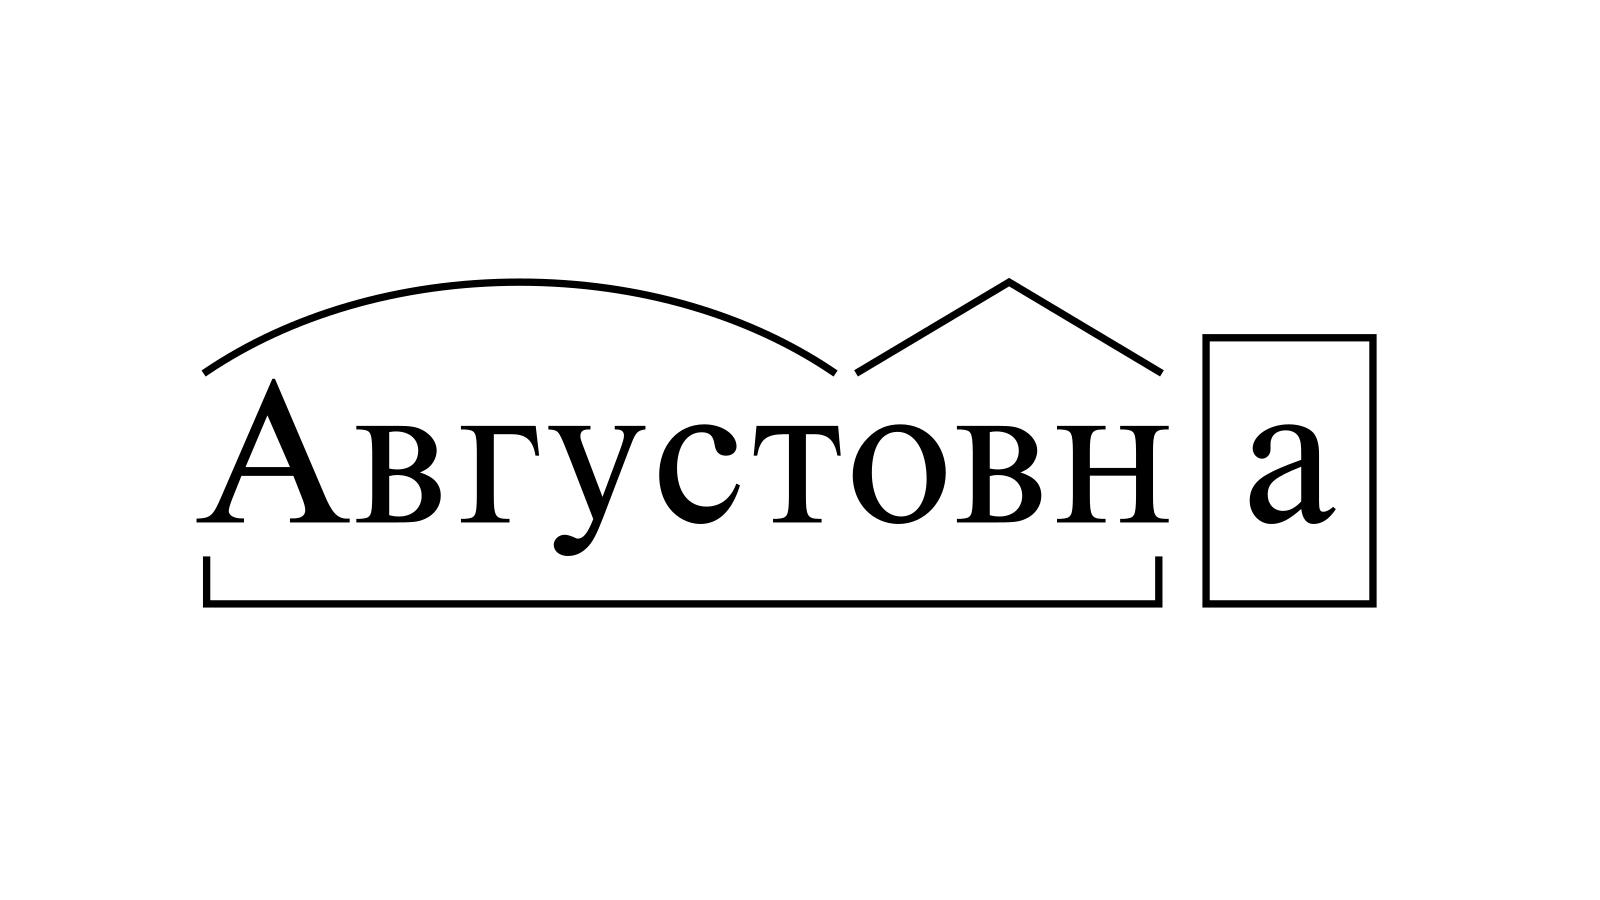 Разбор слова «Августовна» по составу